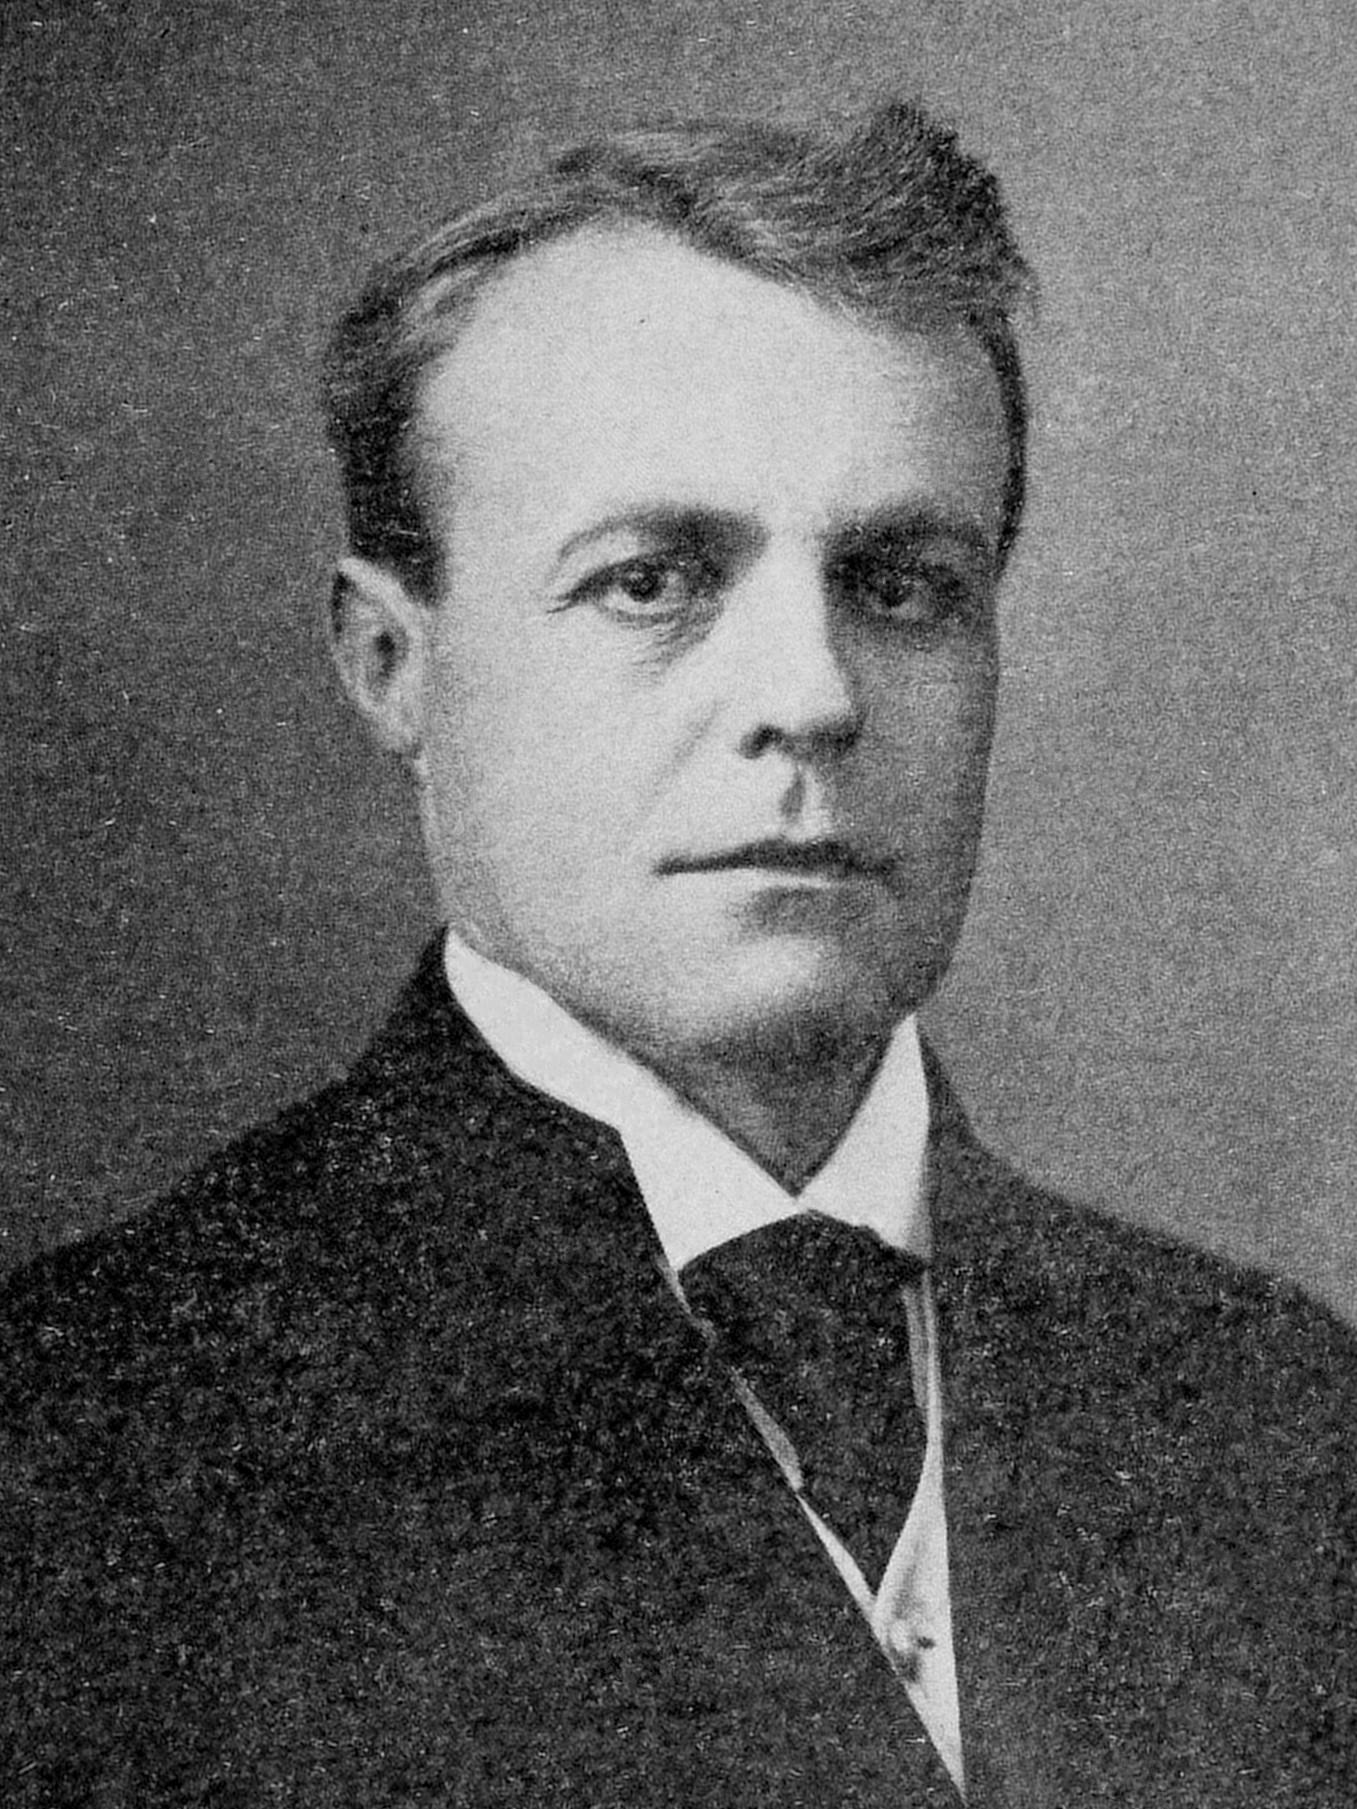 Edward Russell